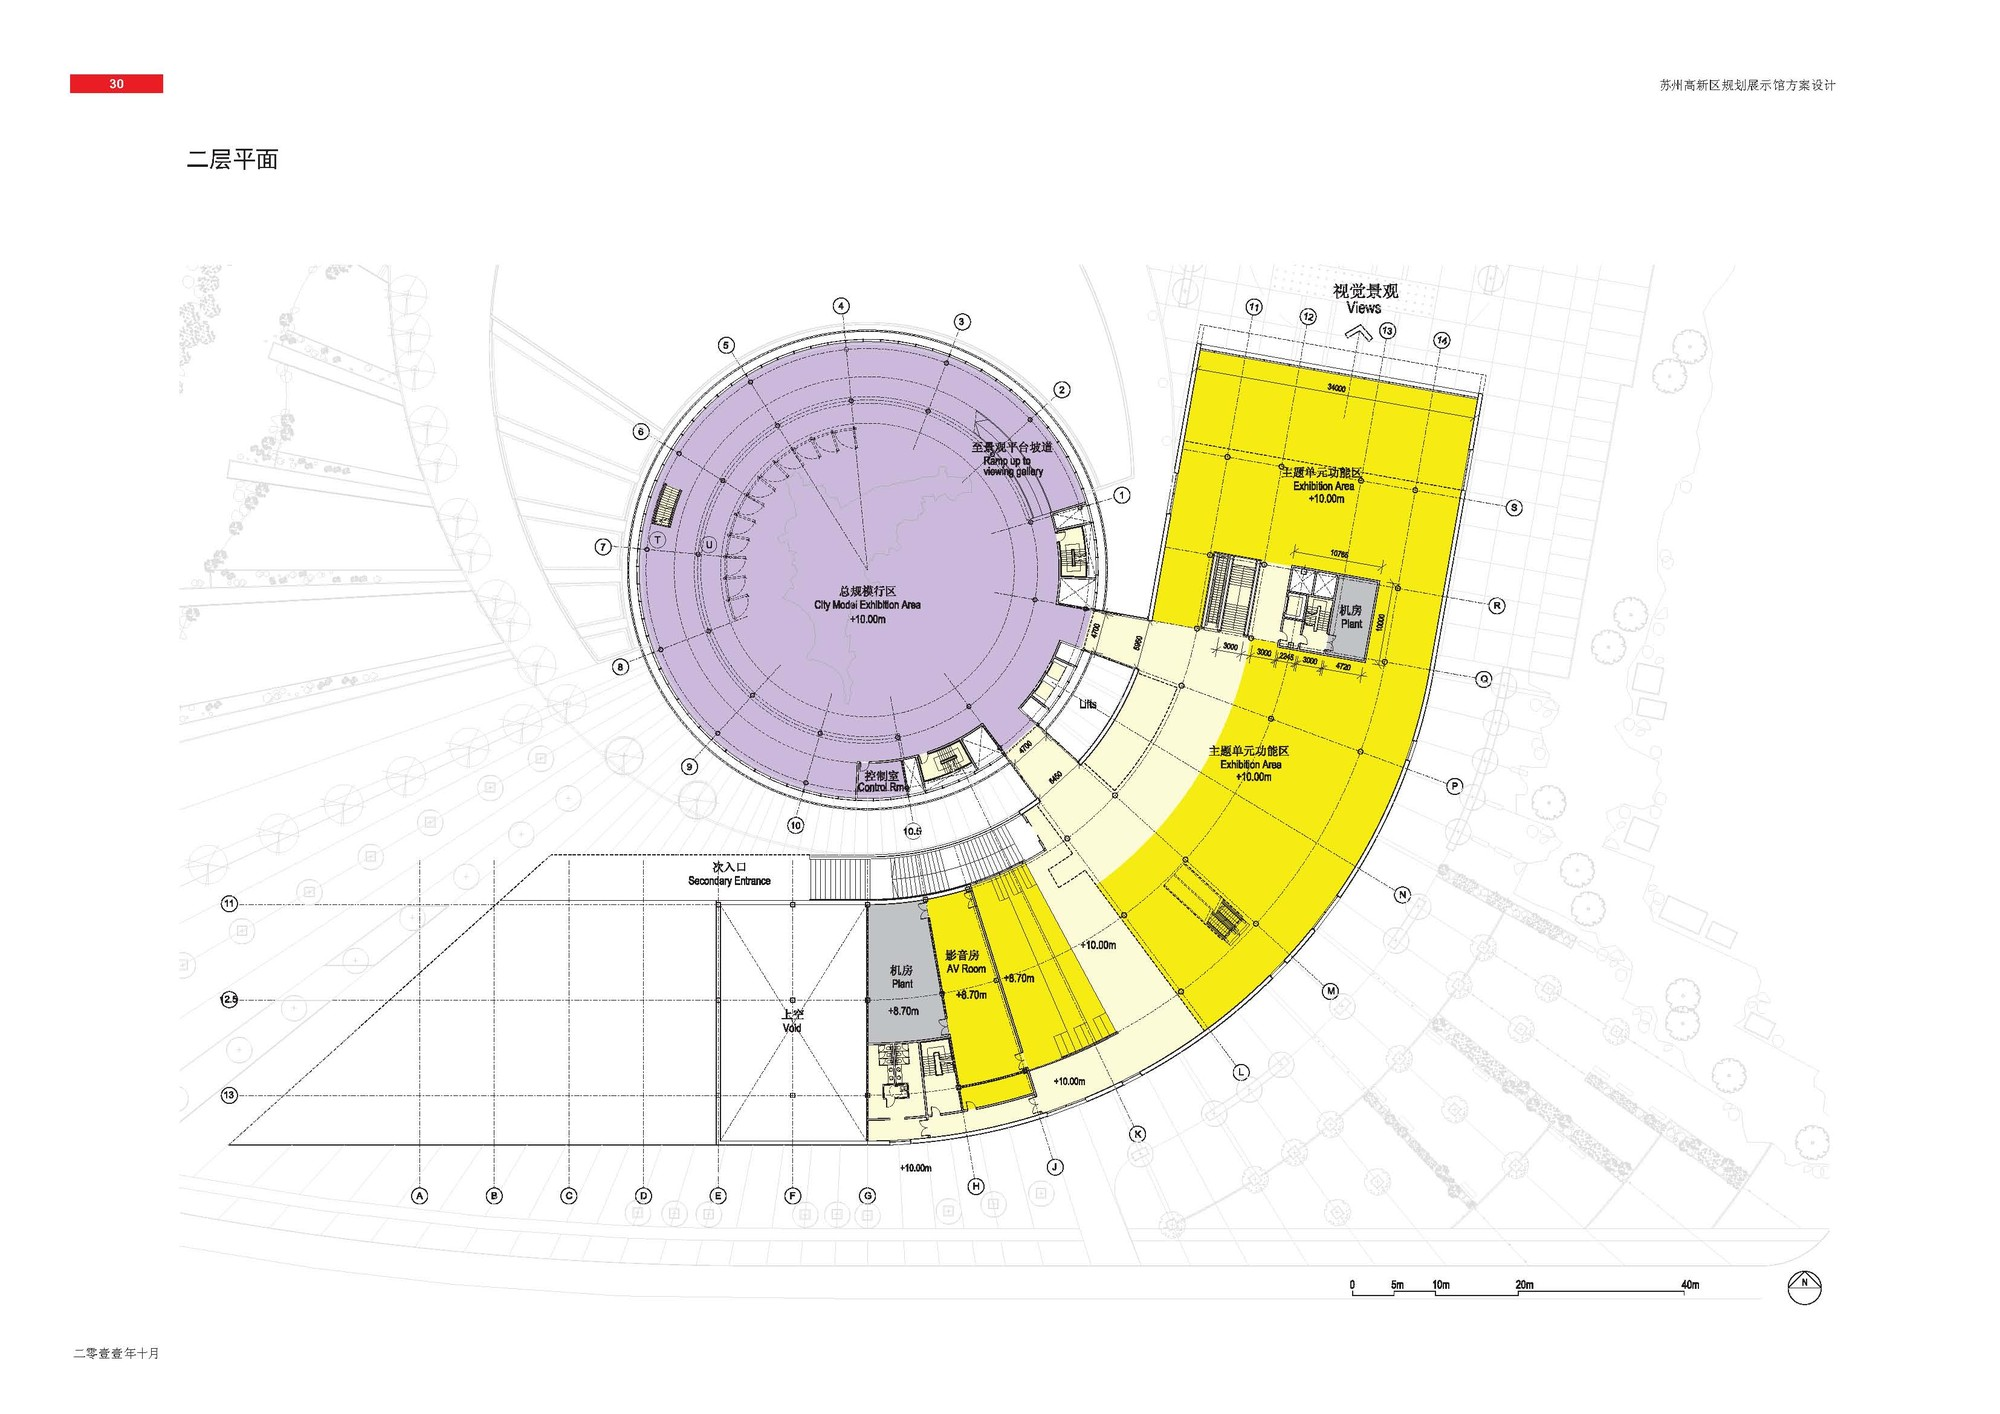 ... of Suzhou SND District Urban Planning Exhibition Hall / BDP - 10